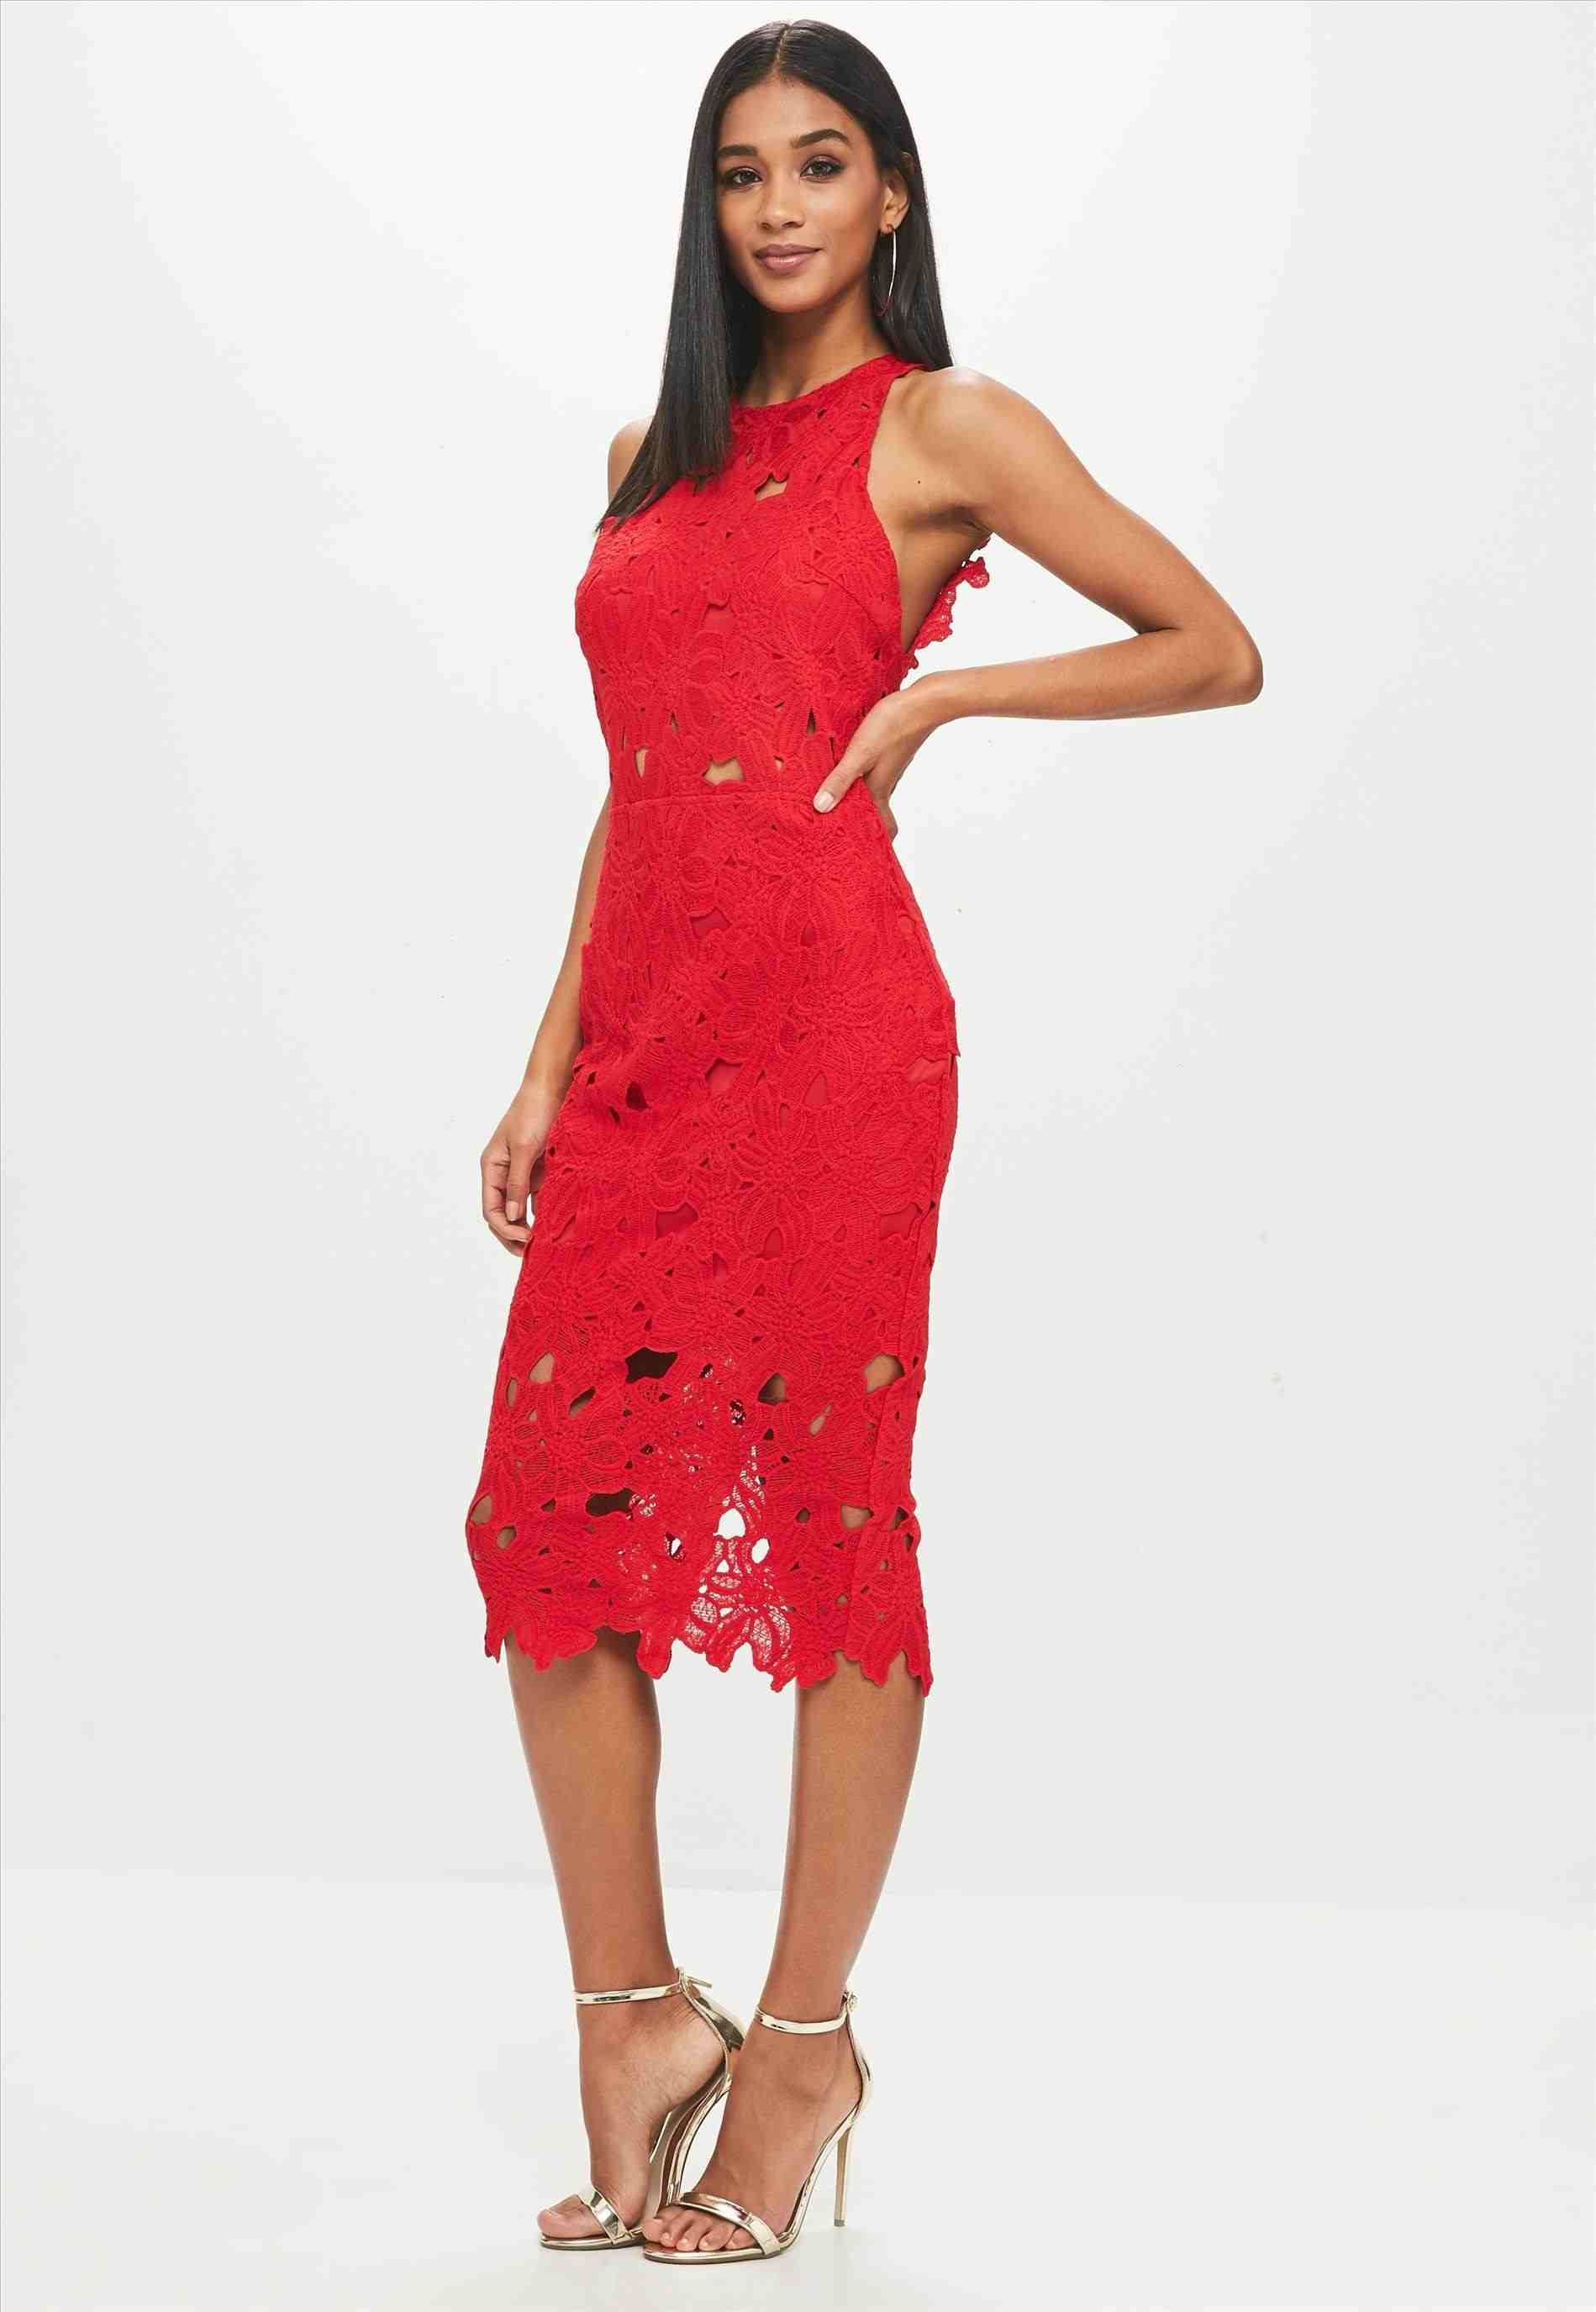 Crochet Lace Dress Red G21 Peach Pink Floral Black Slip Crochet Lace Pencil Tube Bodycon Tea Dress Clothing For Tall Women Red Lace Dress Crochet Lace Dress